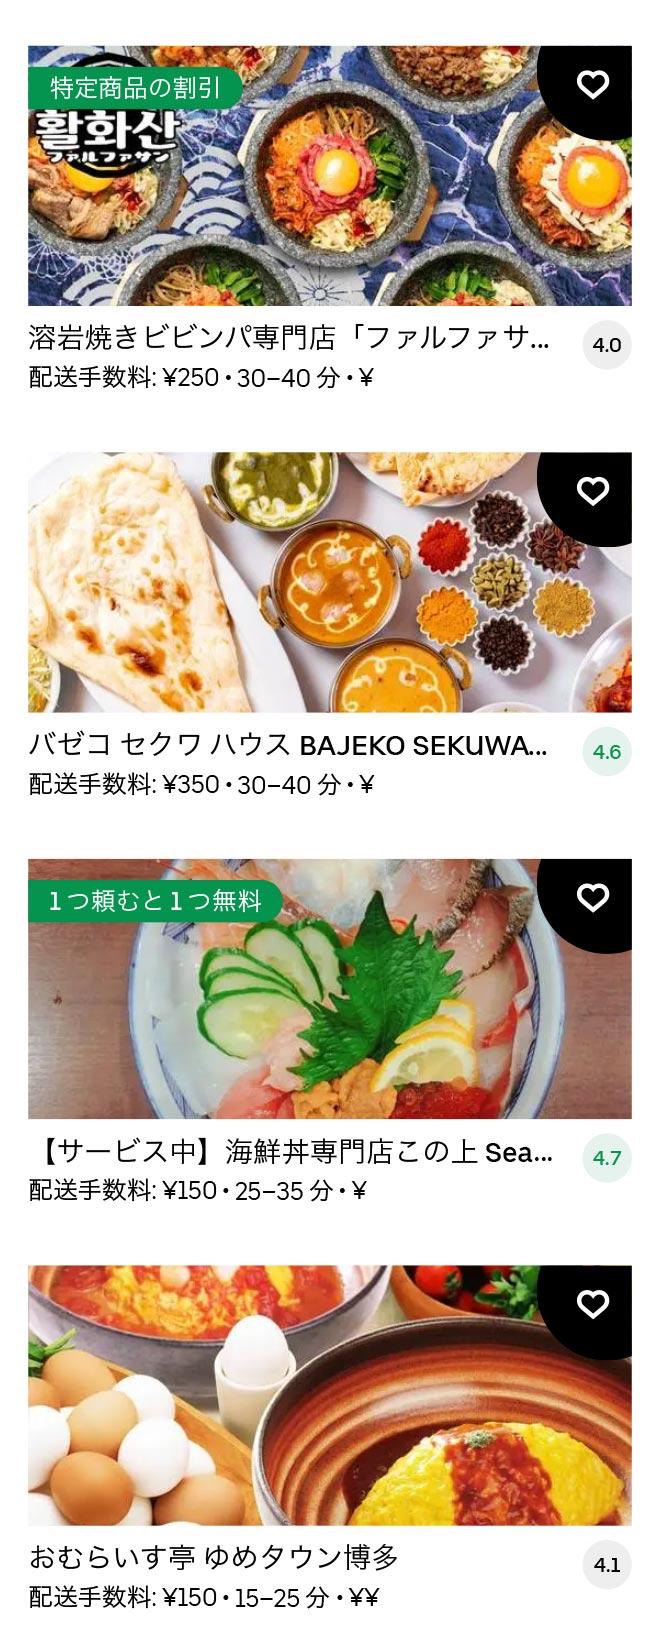 Hakozaki menu 2101 11